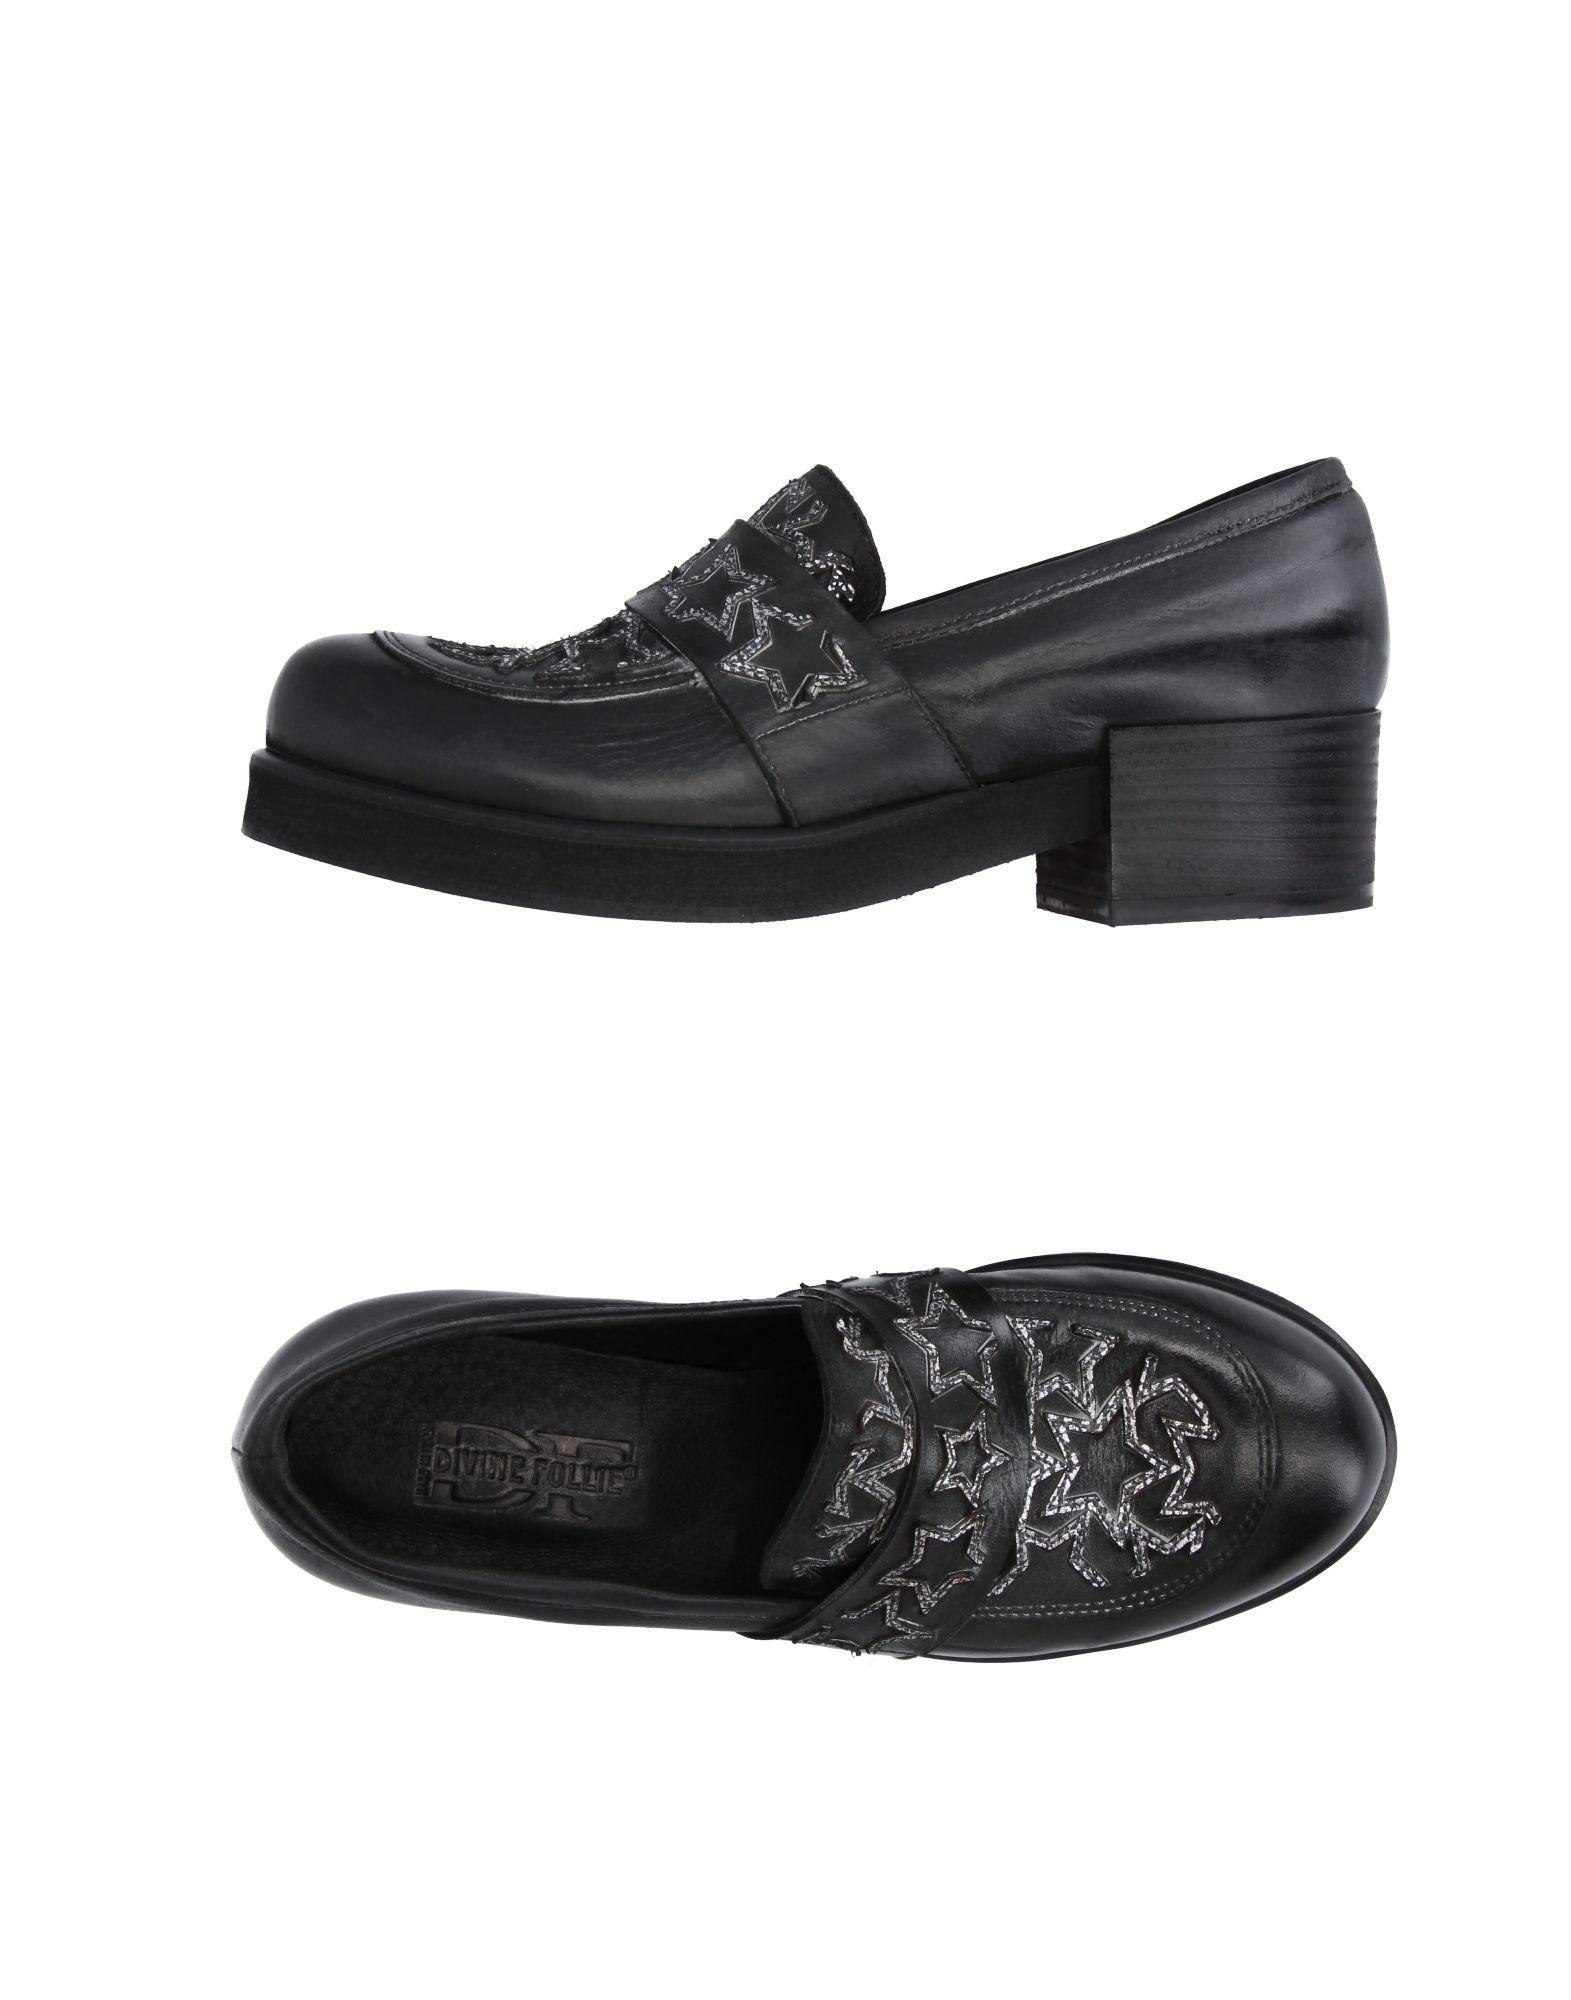 100% Original Cheap Online Huge Range Of FOOTWEAR - Loafers Divine Follie Cheap Sale Latest Collections MHQSoAmZ30